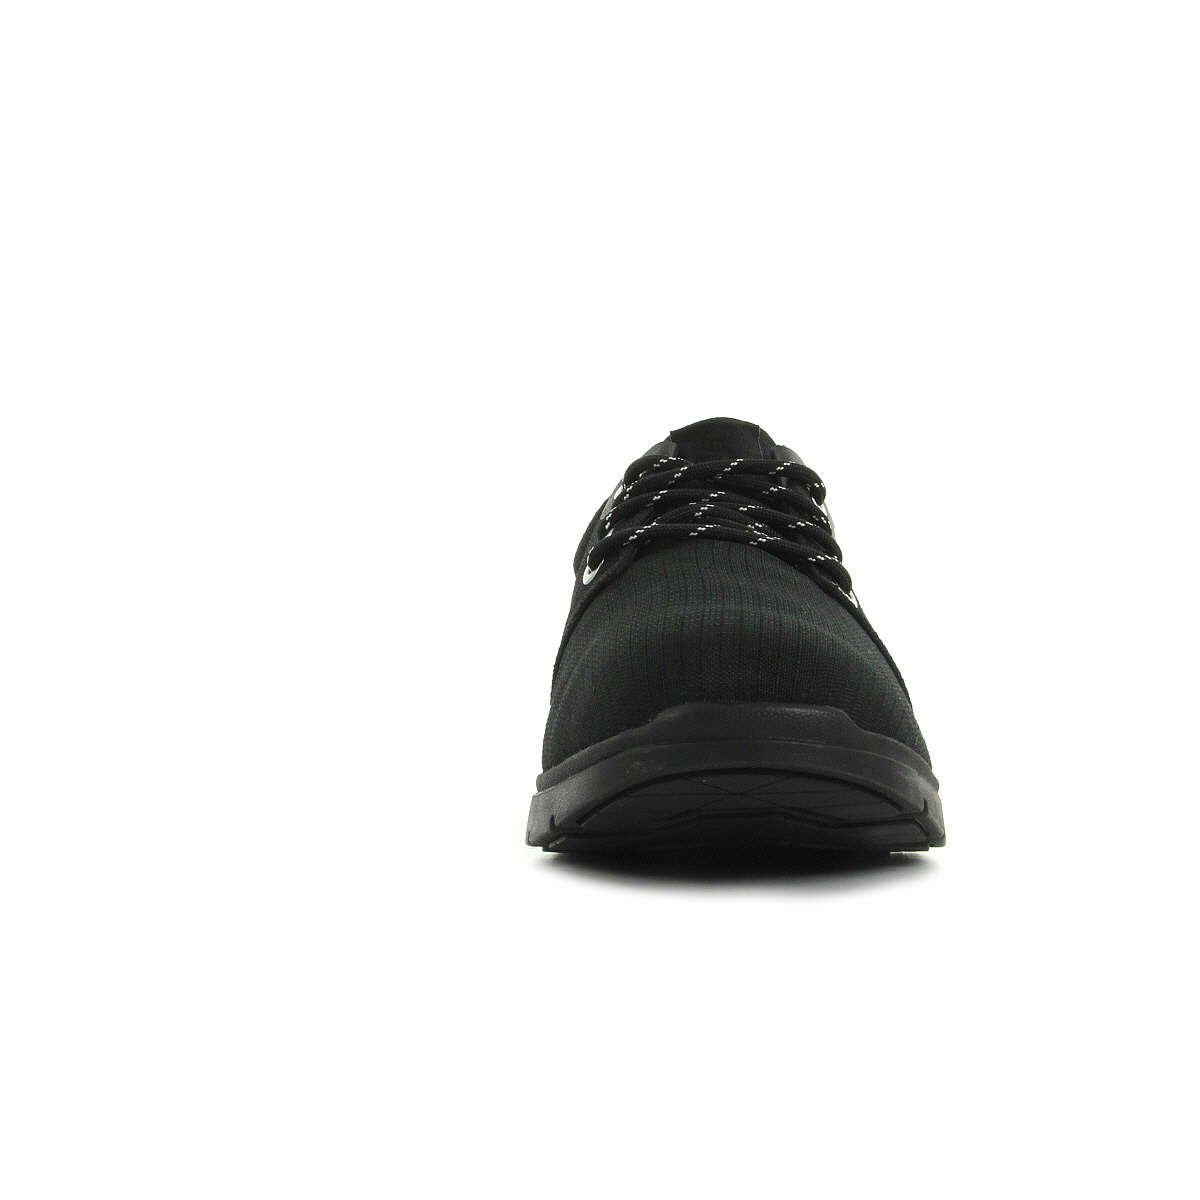 Timberland Killington Ox Black CA17OP, Baskets mode homme